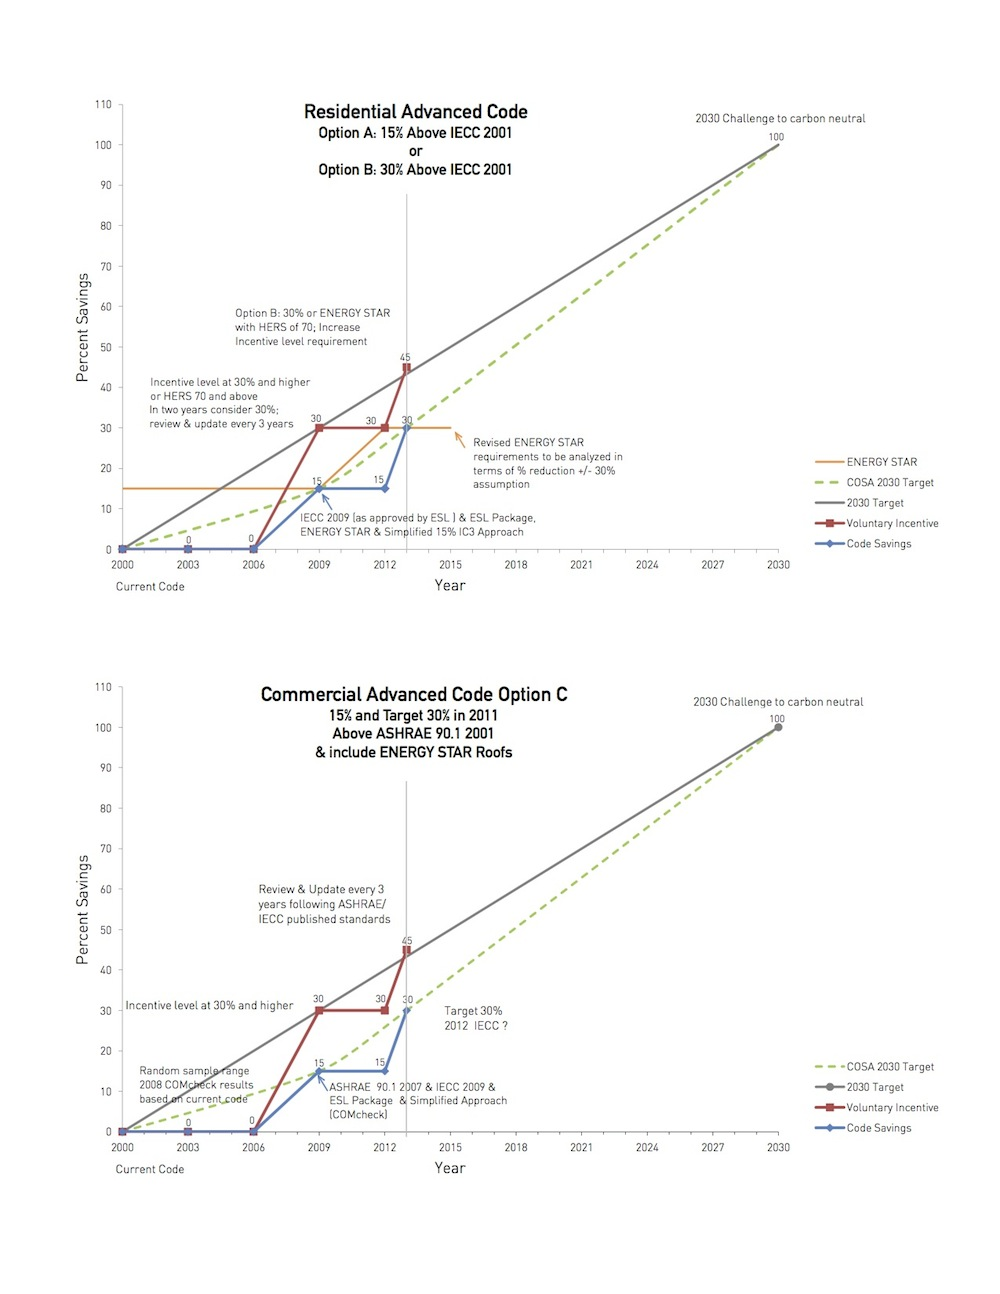 2030 target graphs. Courtesy image.